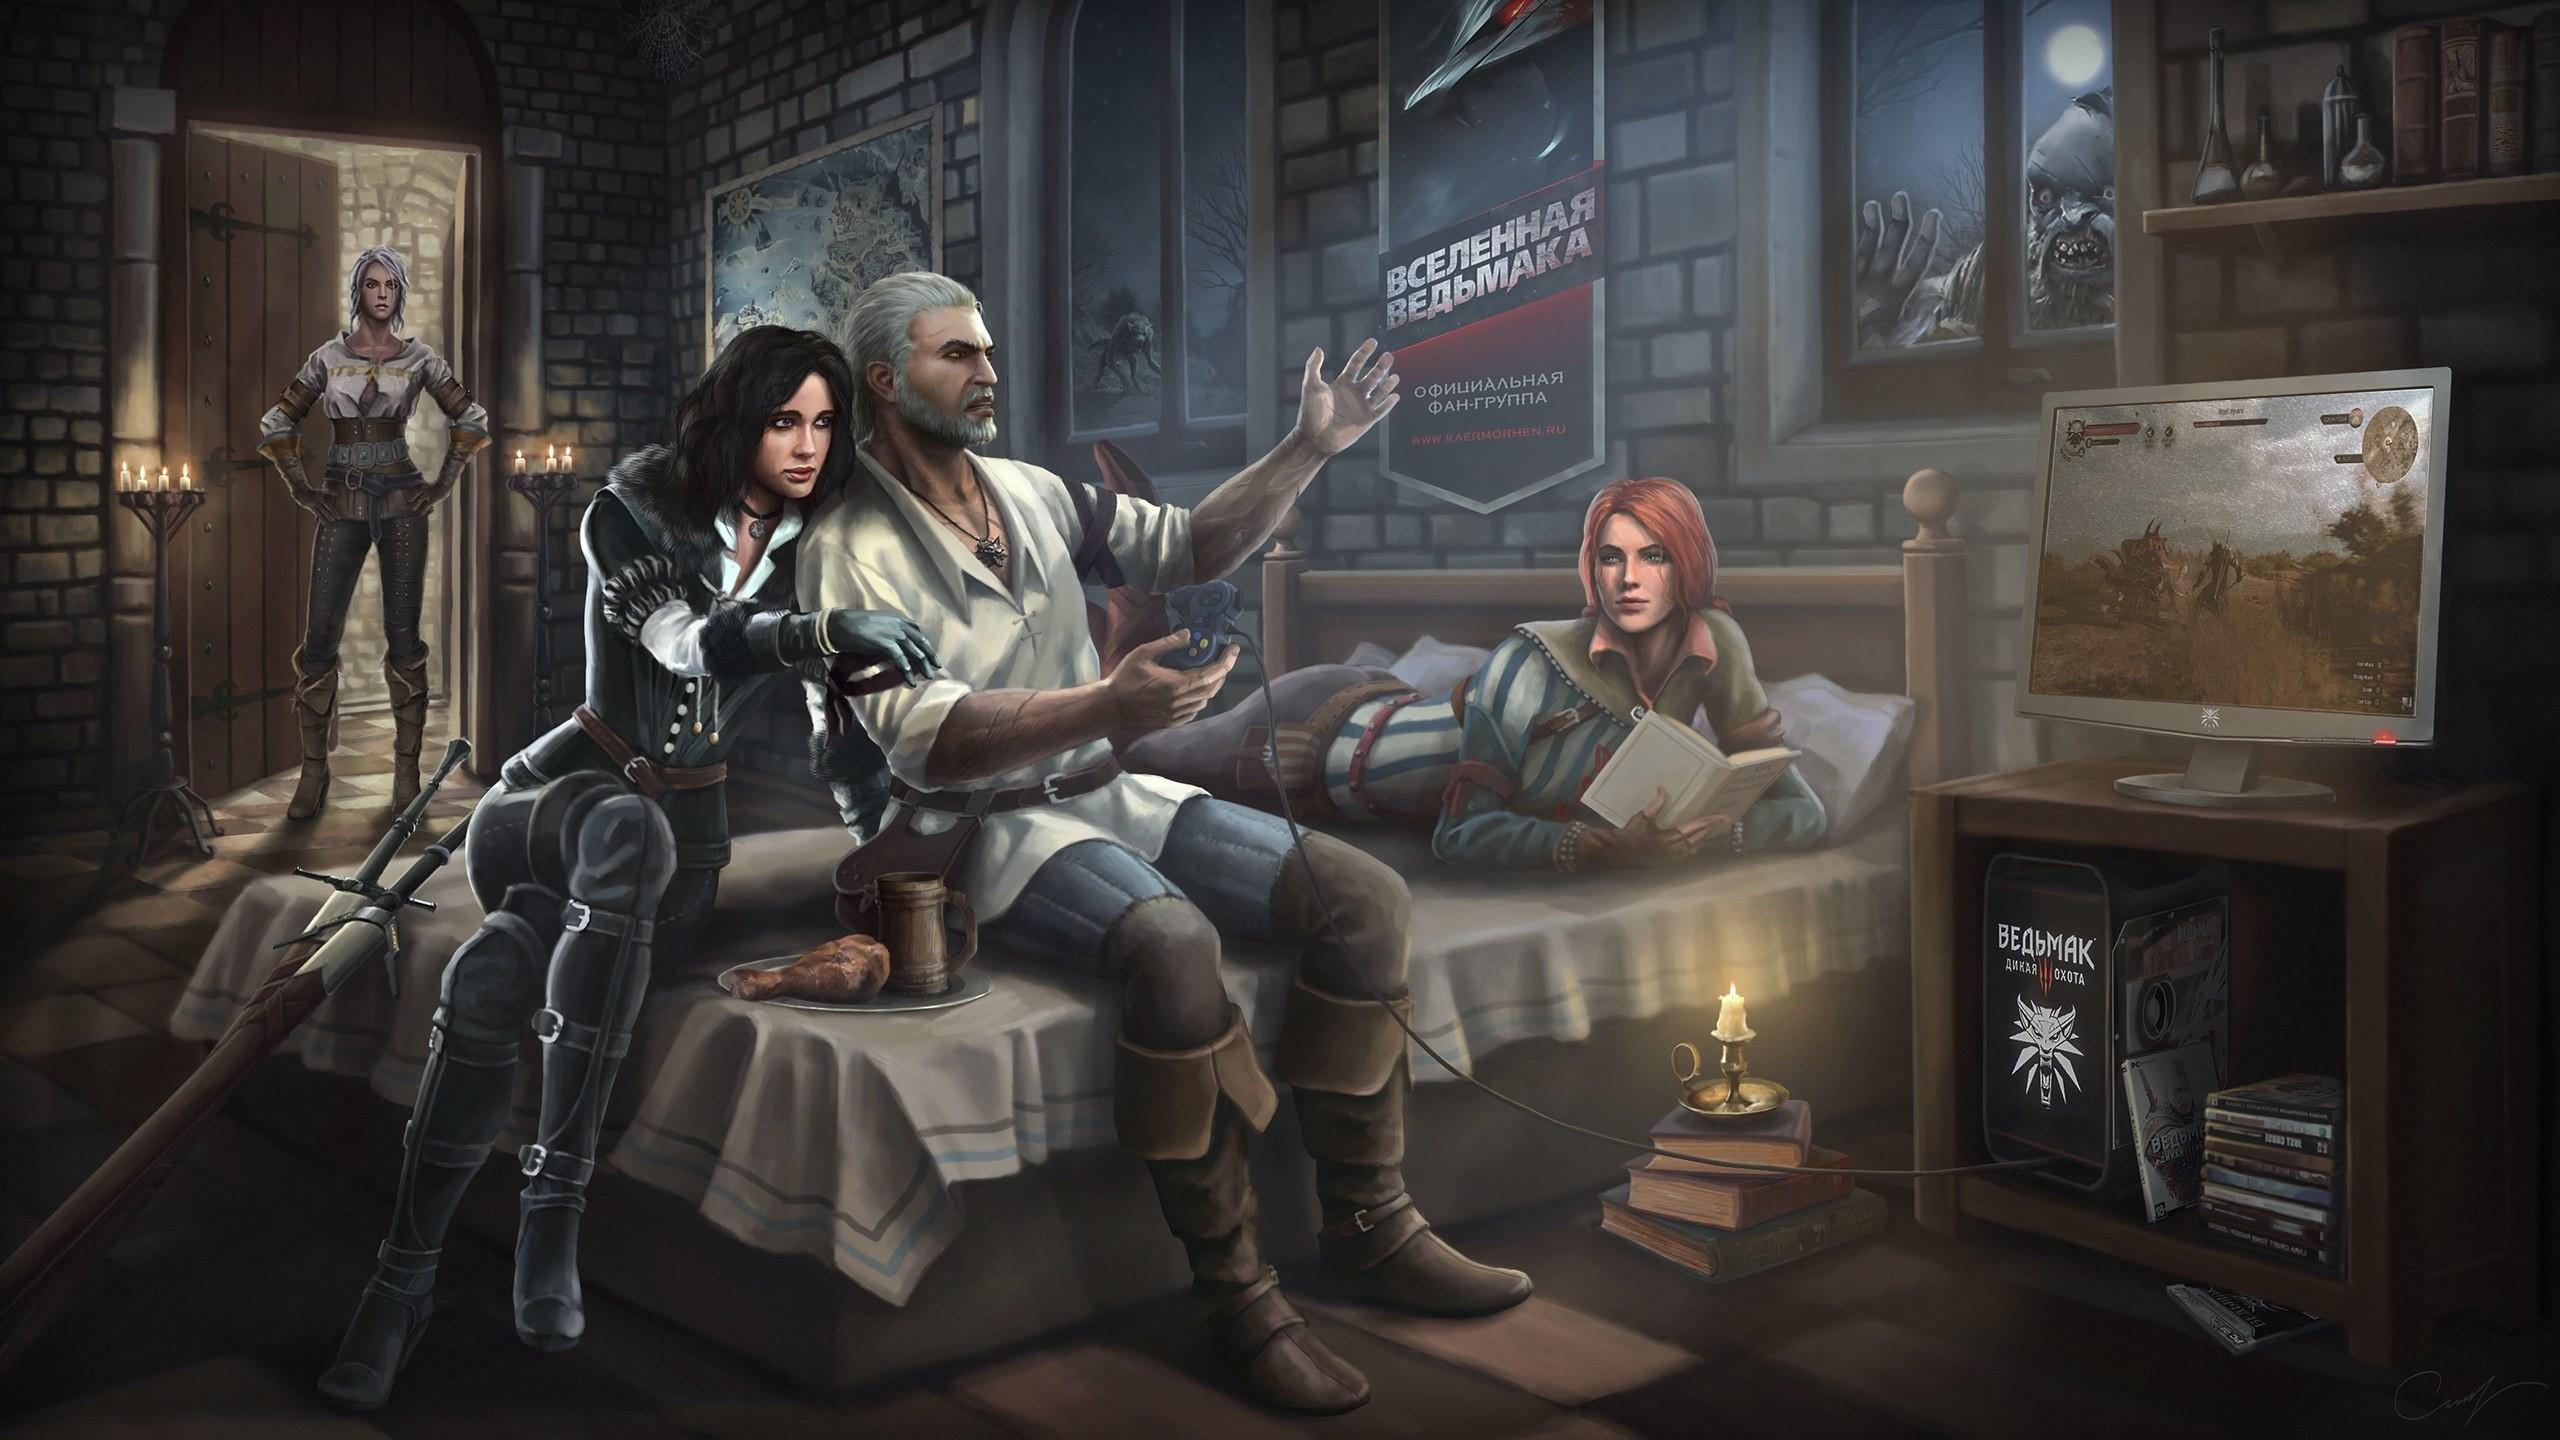 The Witcher 3 Wild Hunt Gentral Hd Wallpaper Ma A Atko 2560x1440 Download Hd Wallpaper Wallpapertip